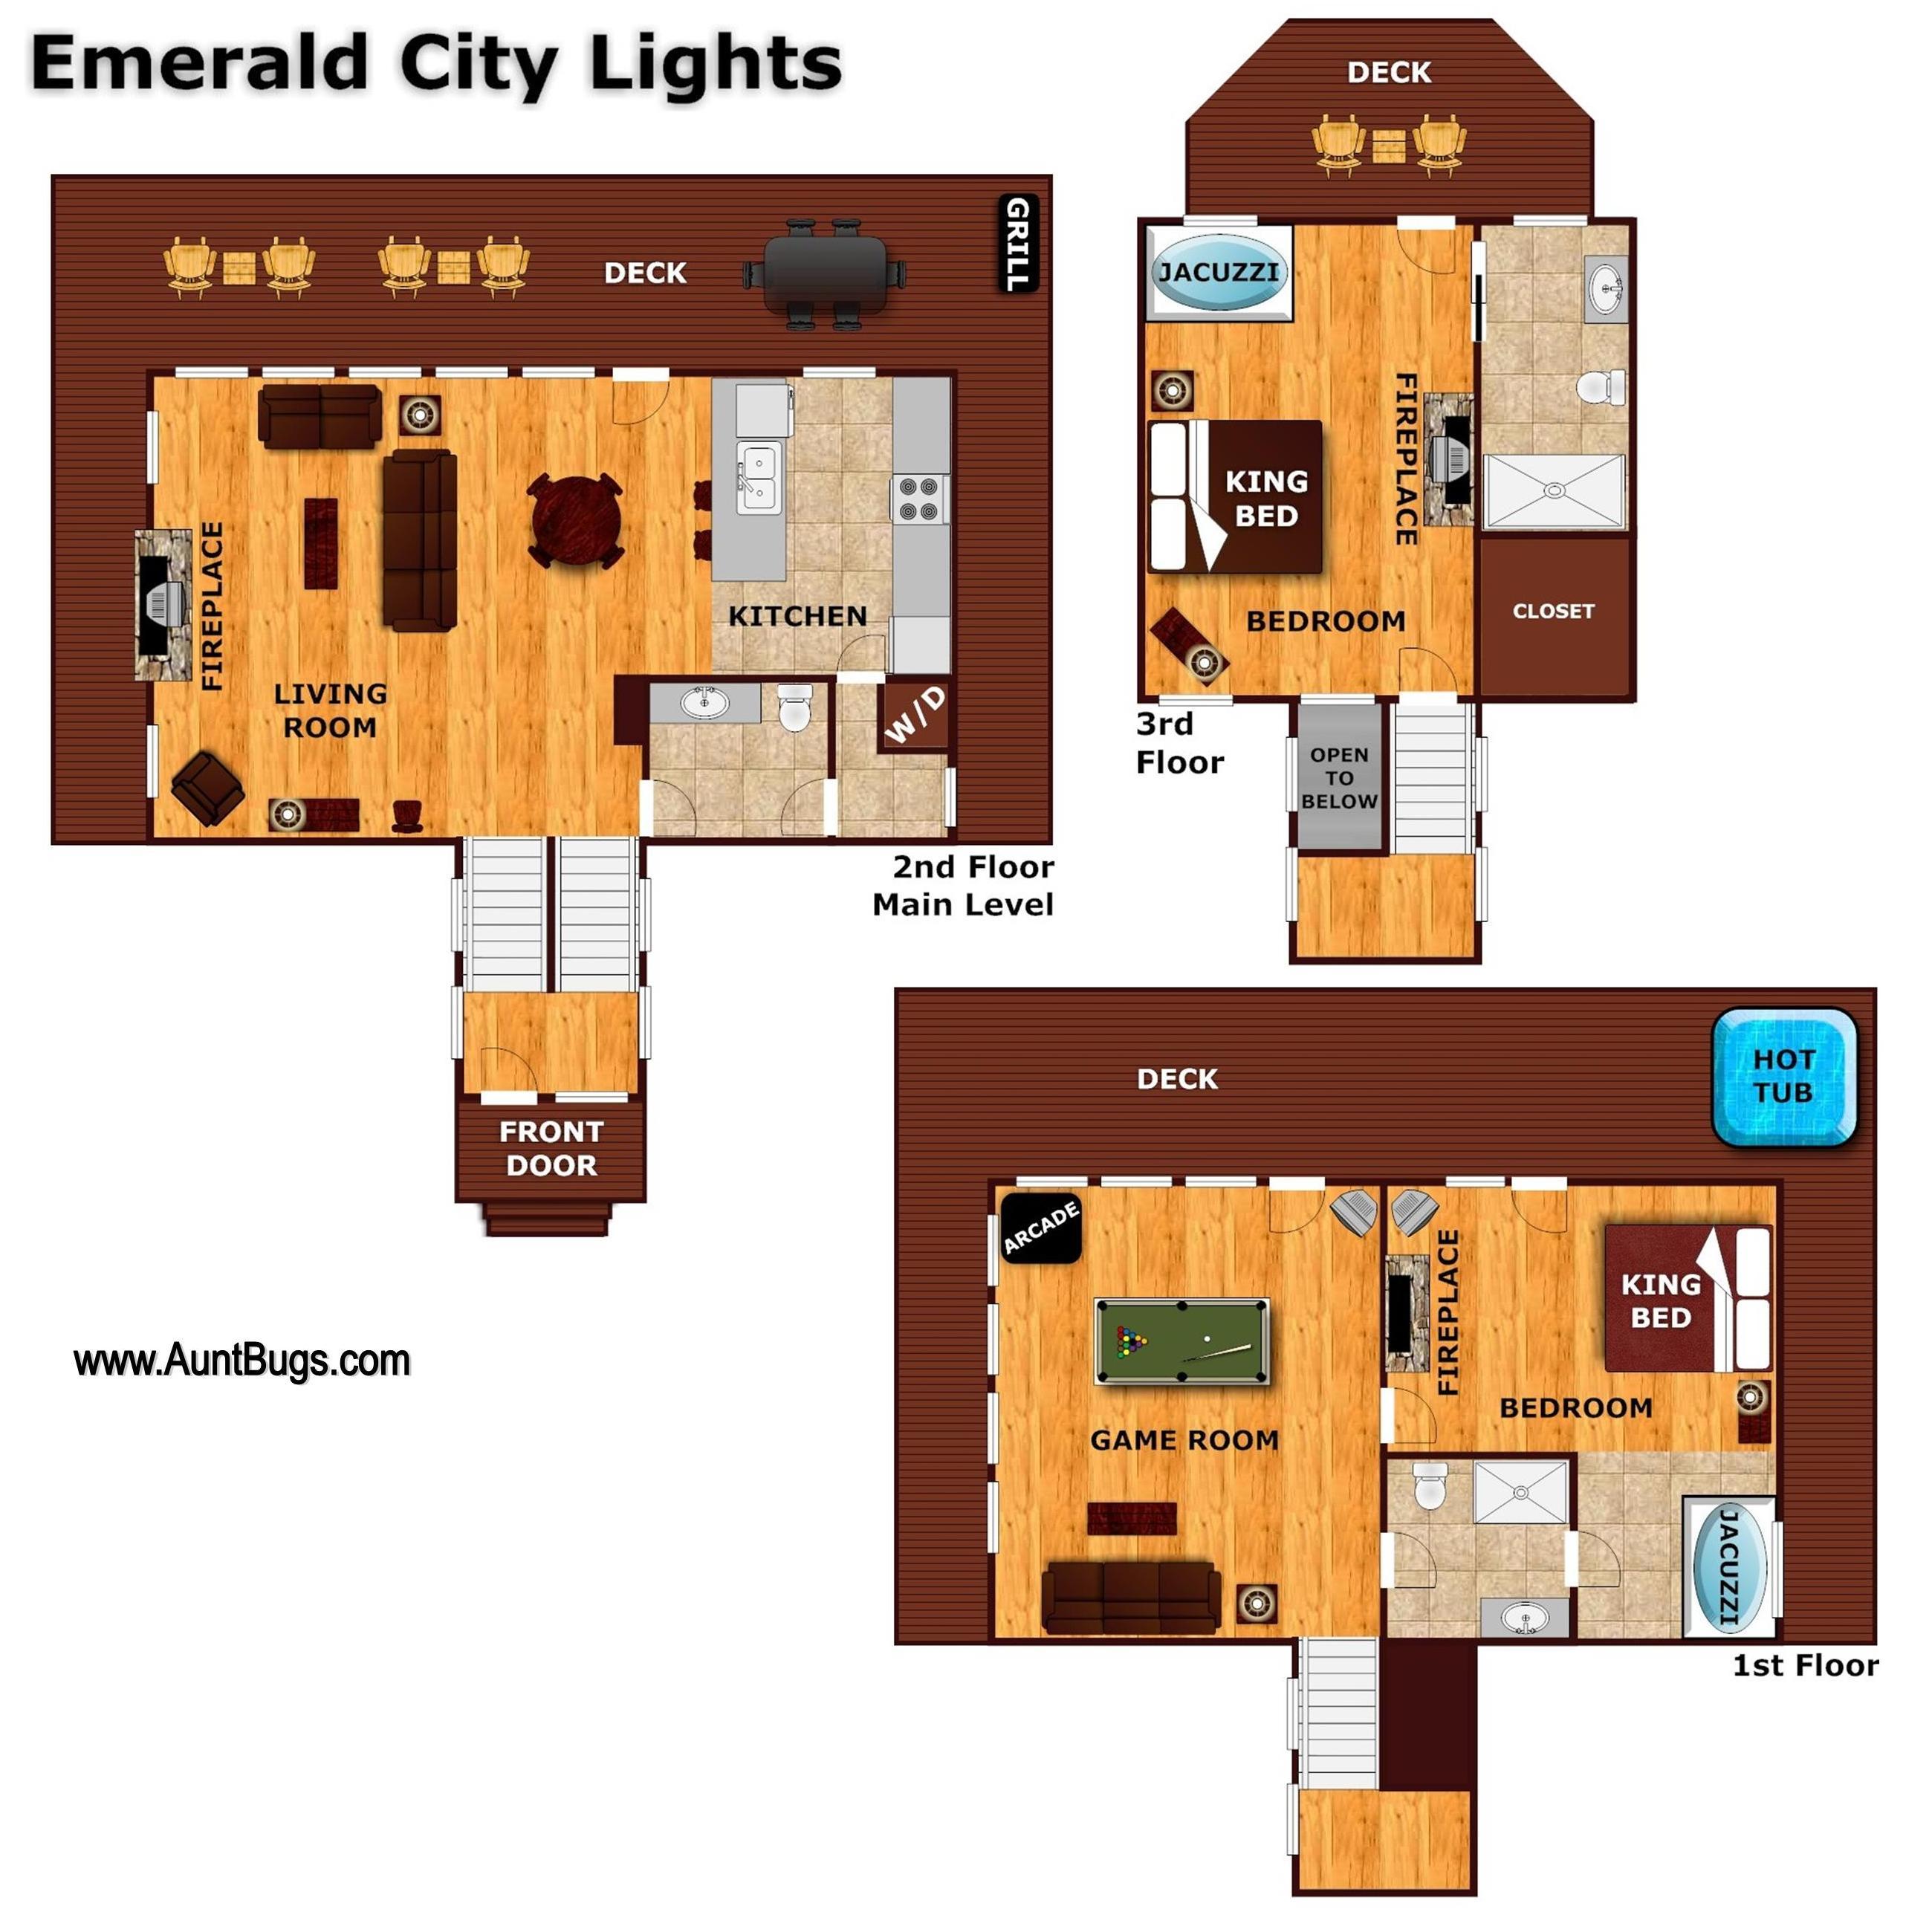 EMERALD CITY LIGHTS #203